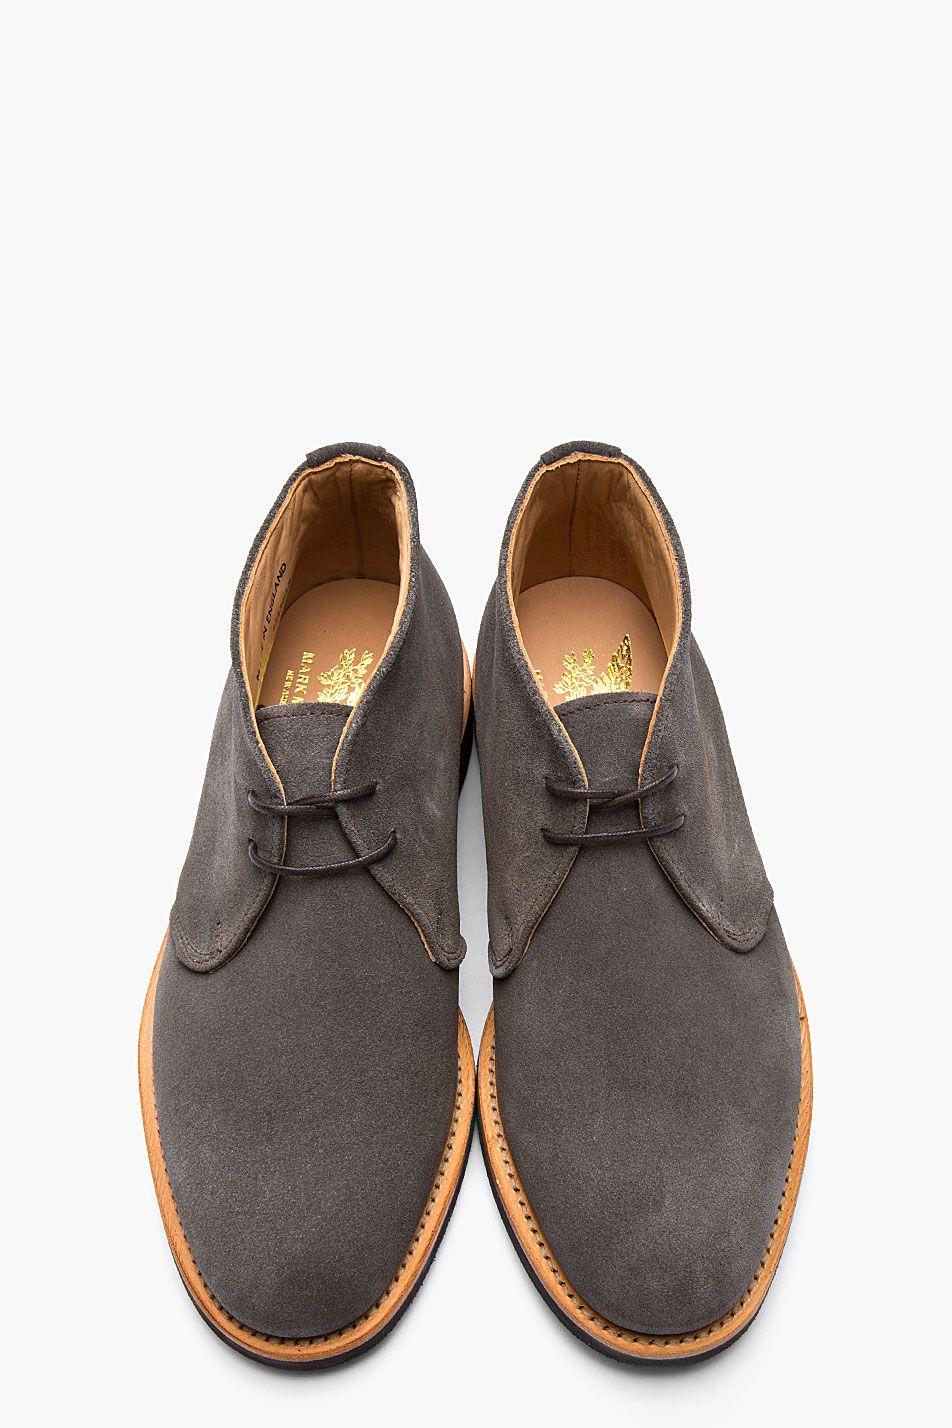 Zapatos Mcnairy Calzado Suede Chukkas Pinterest Charcoal Mark wpfqIA